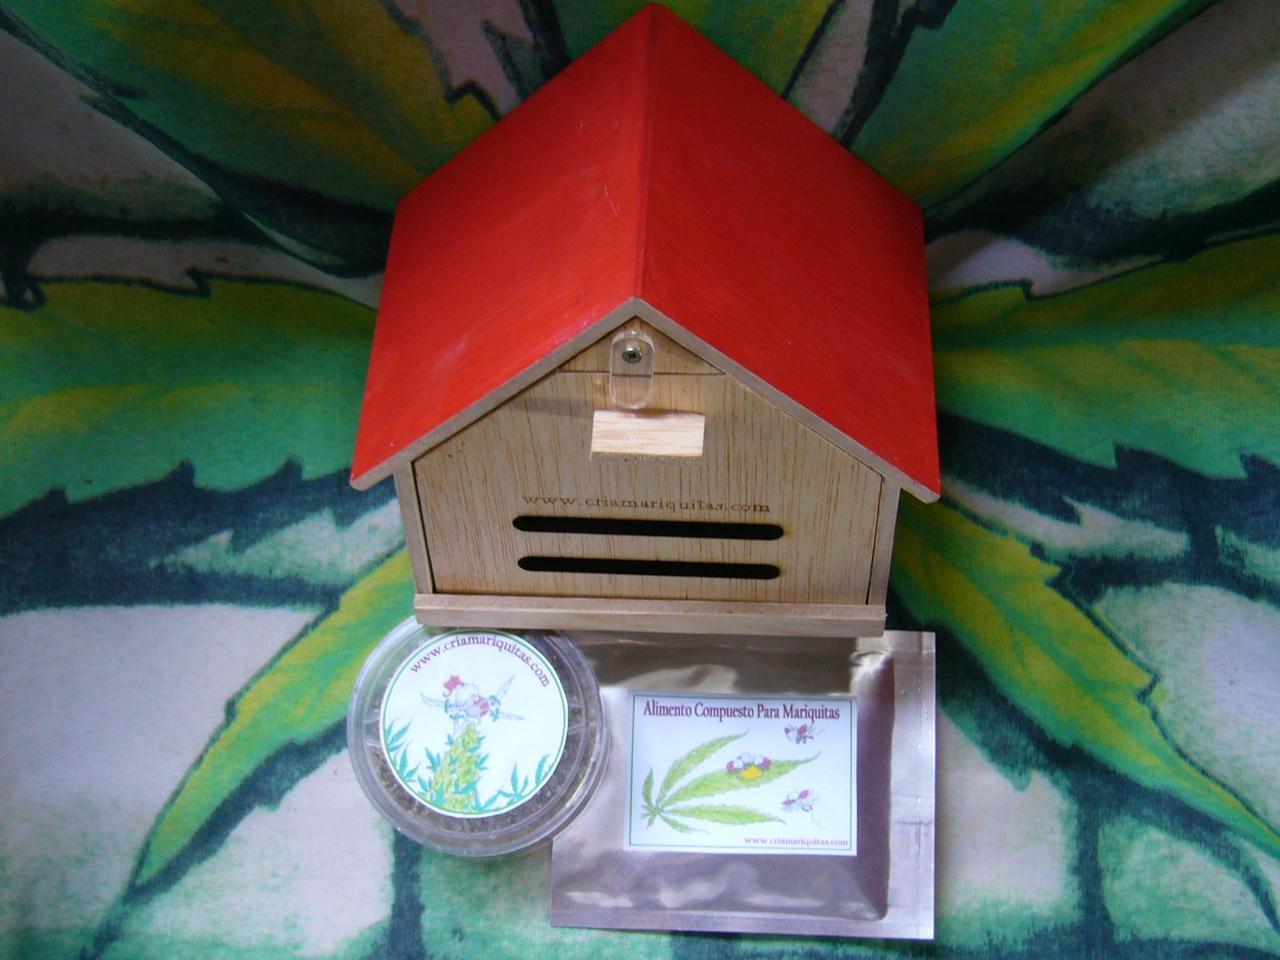 Kit cultivo de interior paperblog for Cultivo interior casero